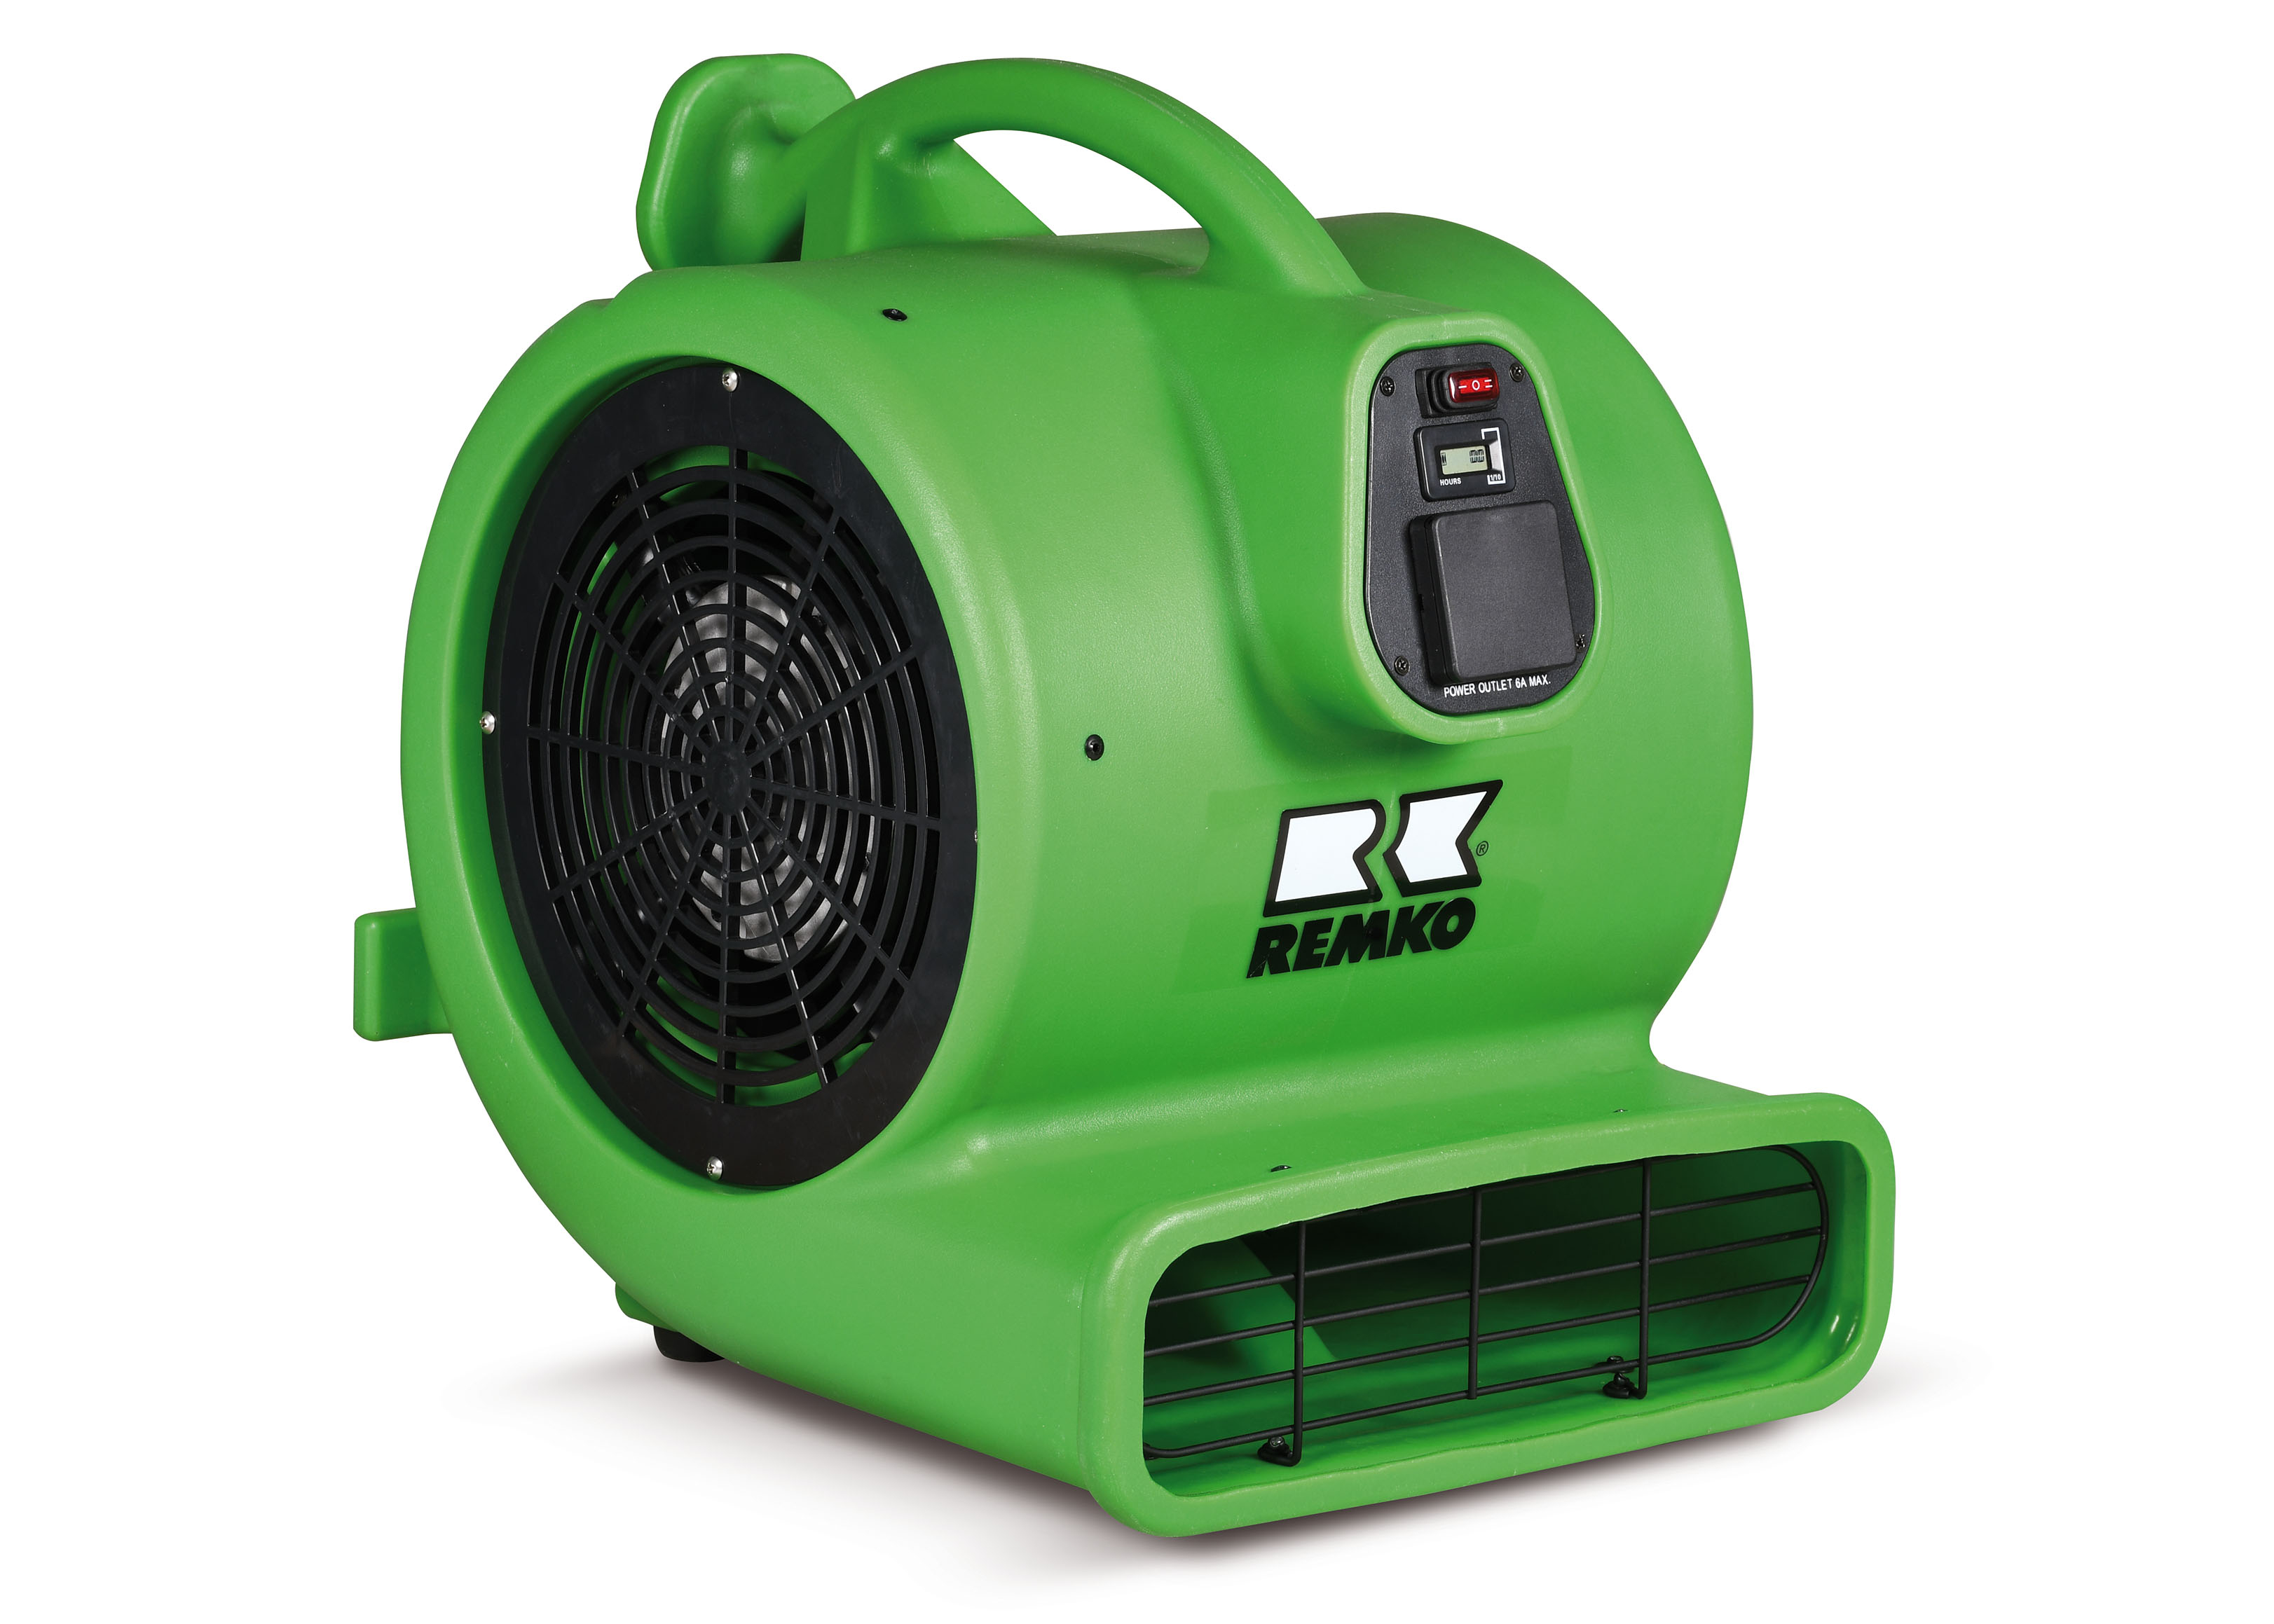 REMKO RTV 35 Turbo-Ventilator mit Netzsteckdose und Stundenzähler